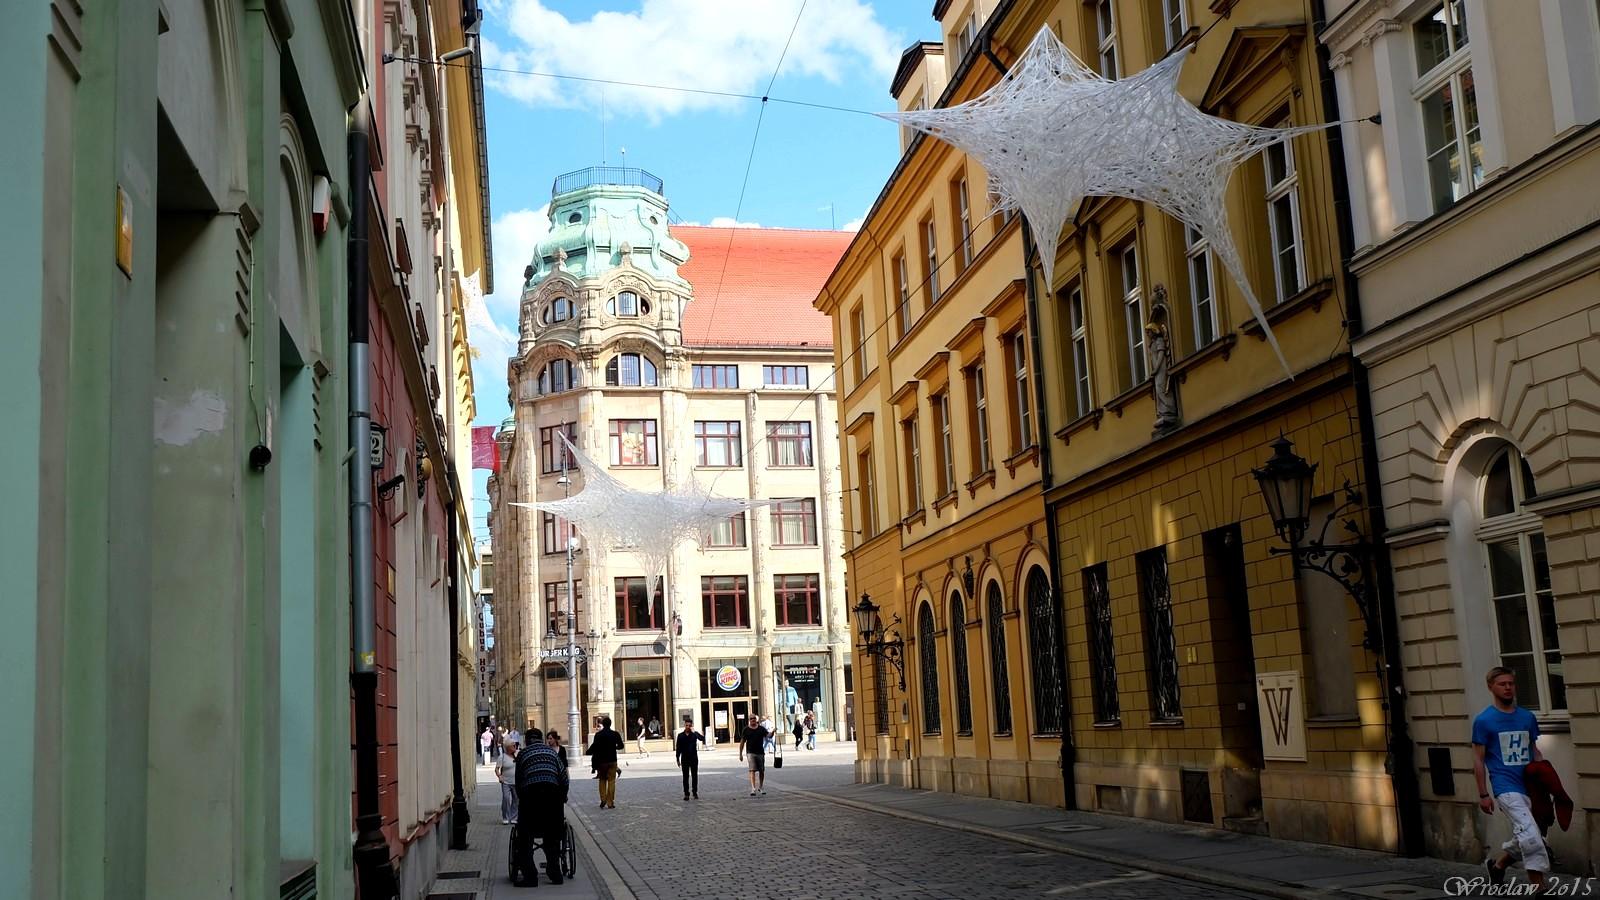 Sukennice, Wroclaw, Poland